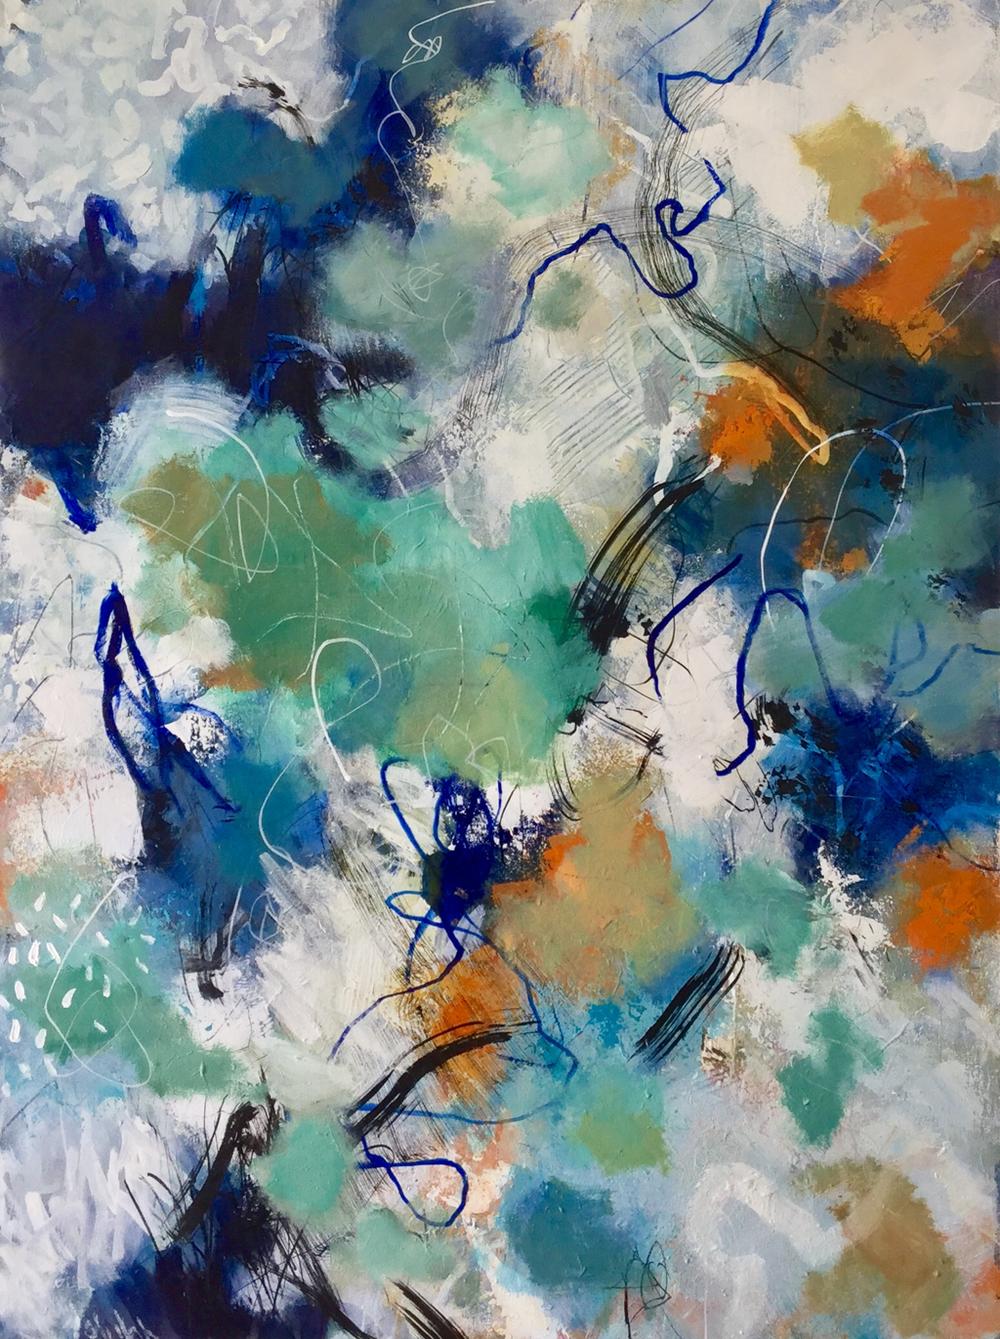 Shaken my Skin-Shape  Talulah Lautrec-Nunes, acrylic on canvas, 1020mm x 760mm  $1,800.00